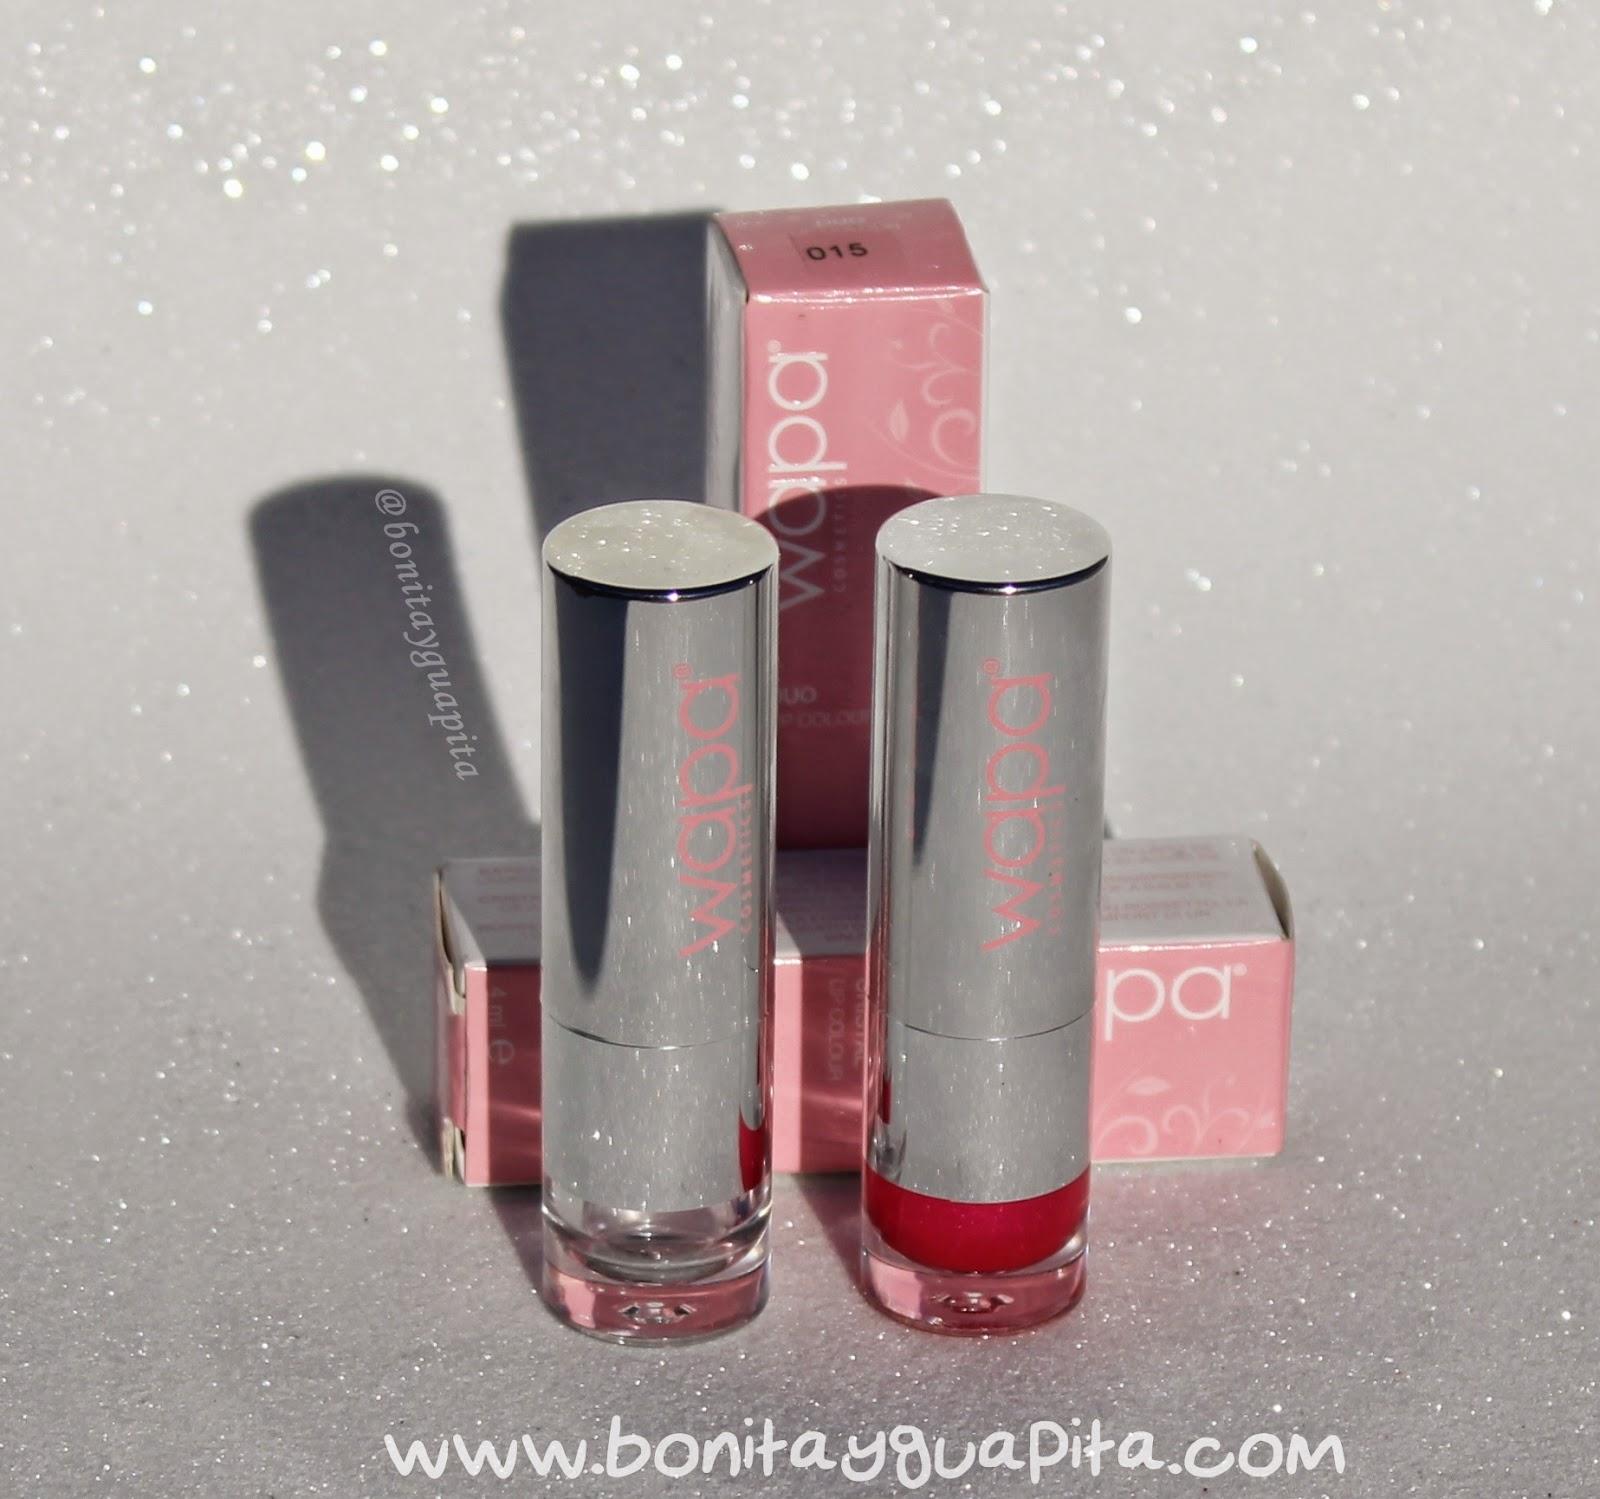 wapa cosmetics